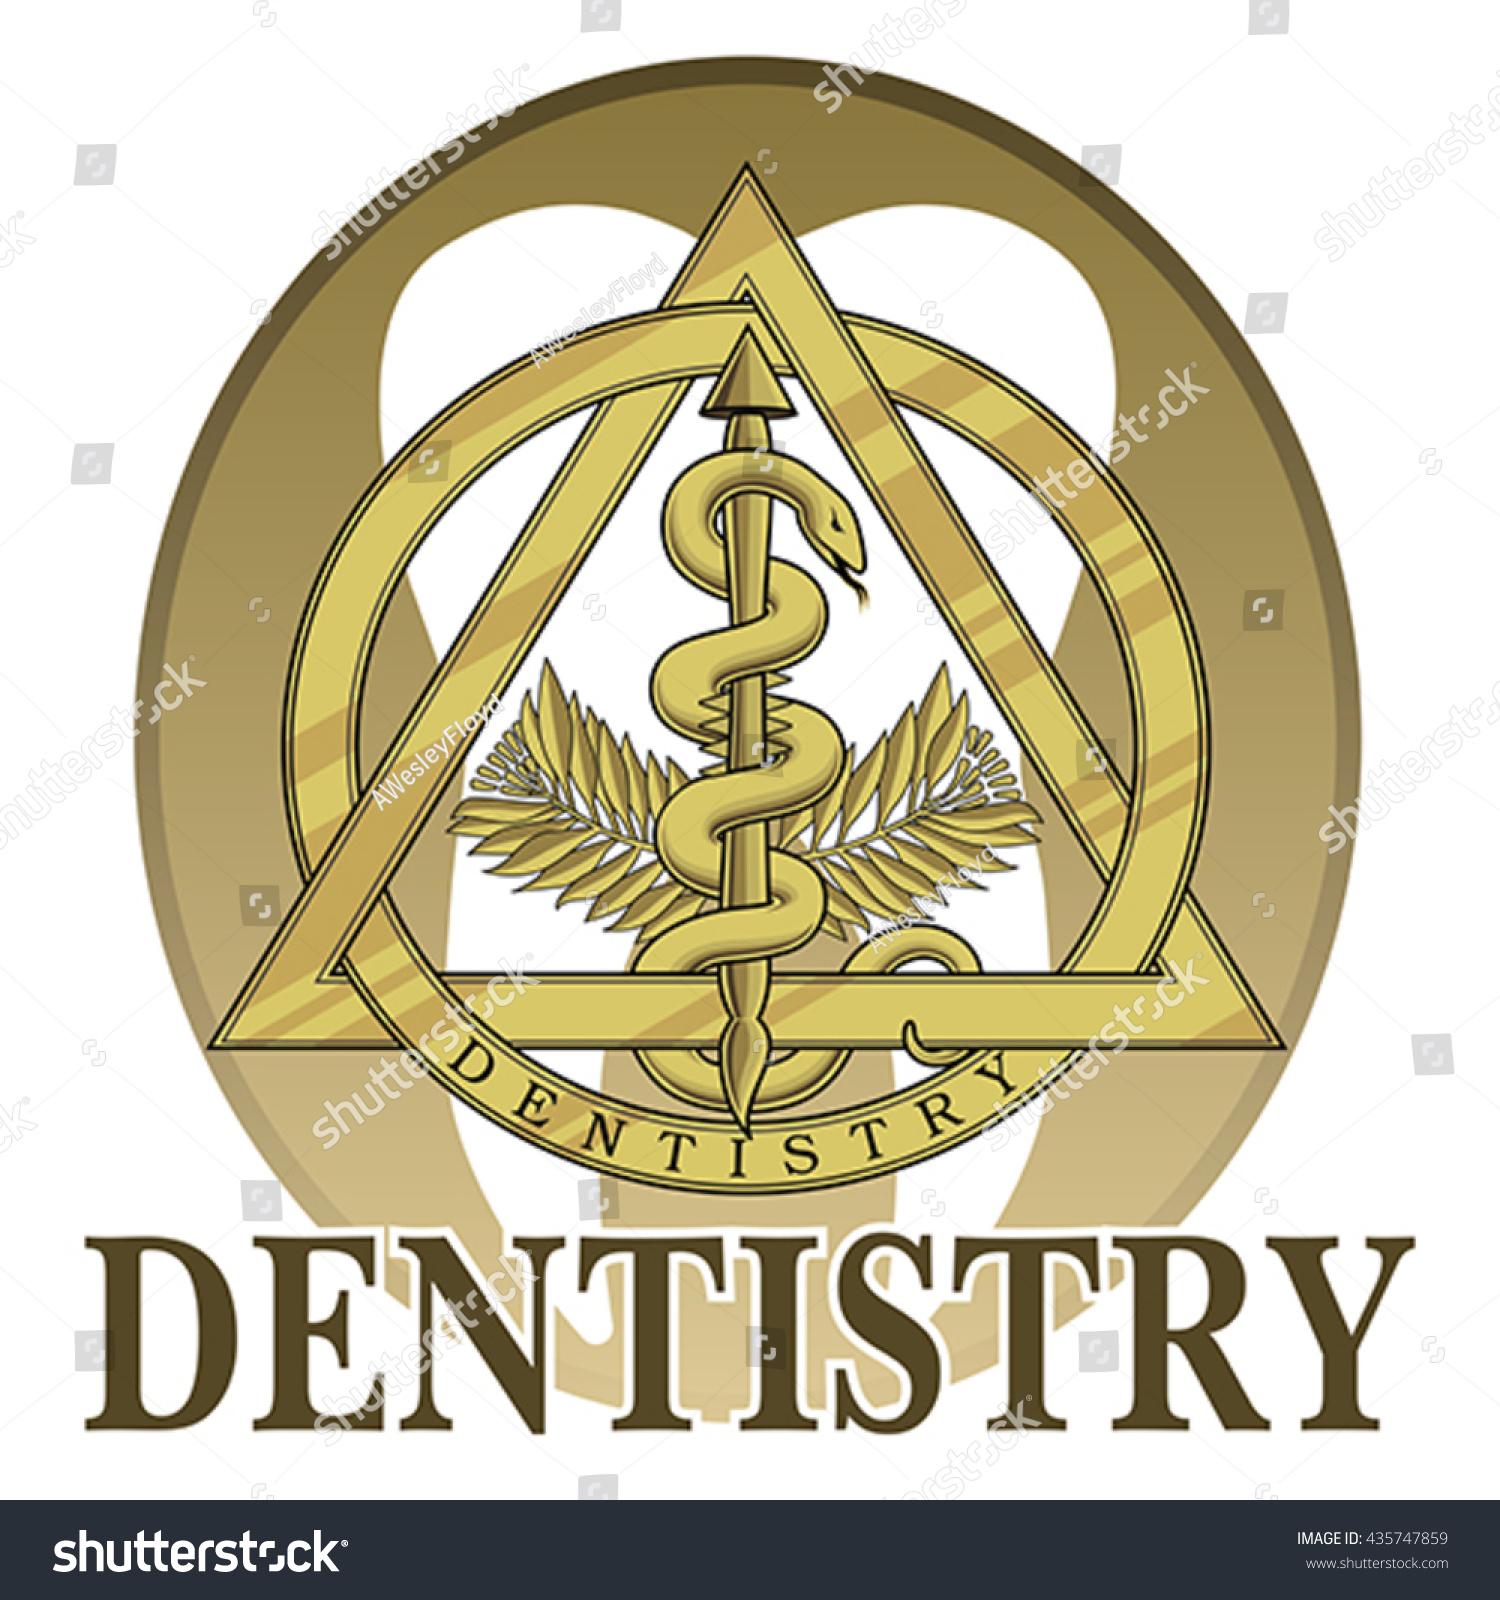 Dentistry Symbol Design Illustration Design Template Stock Vector